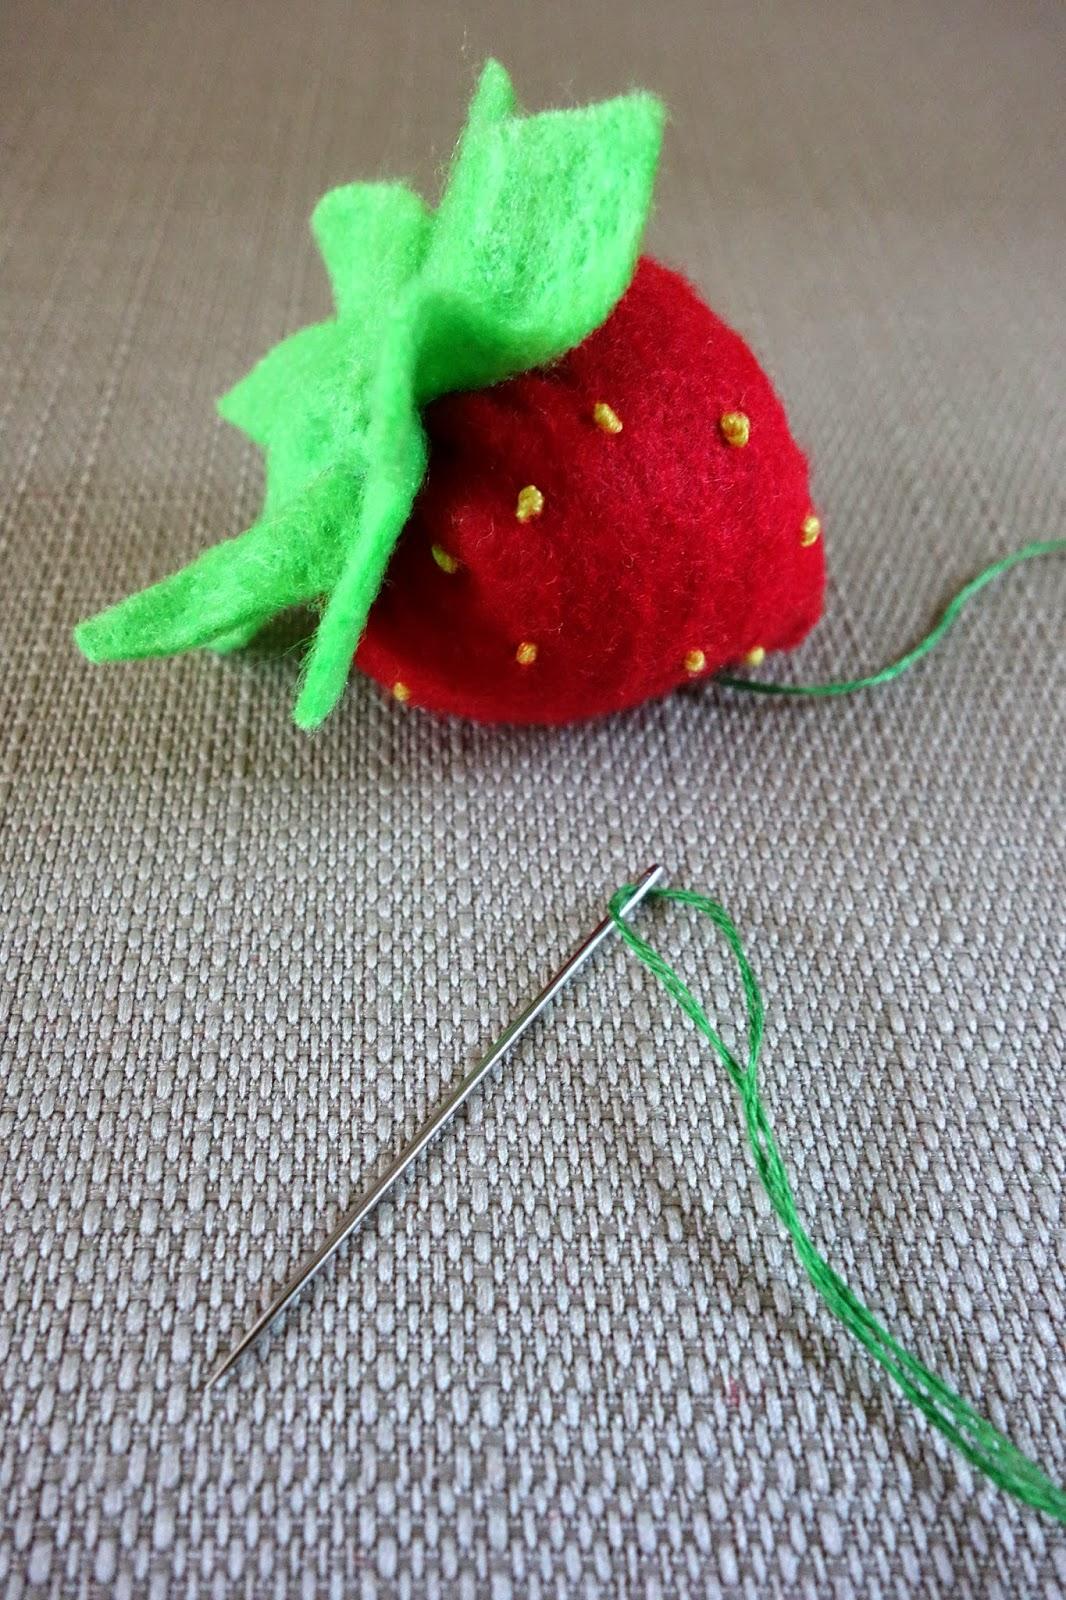 strawberry needles - photo #26